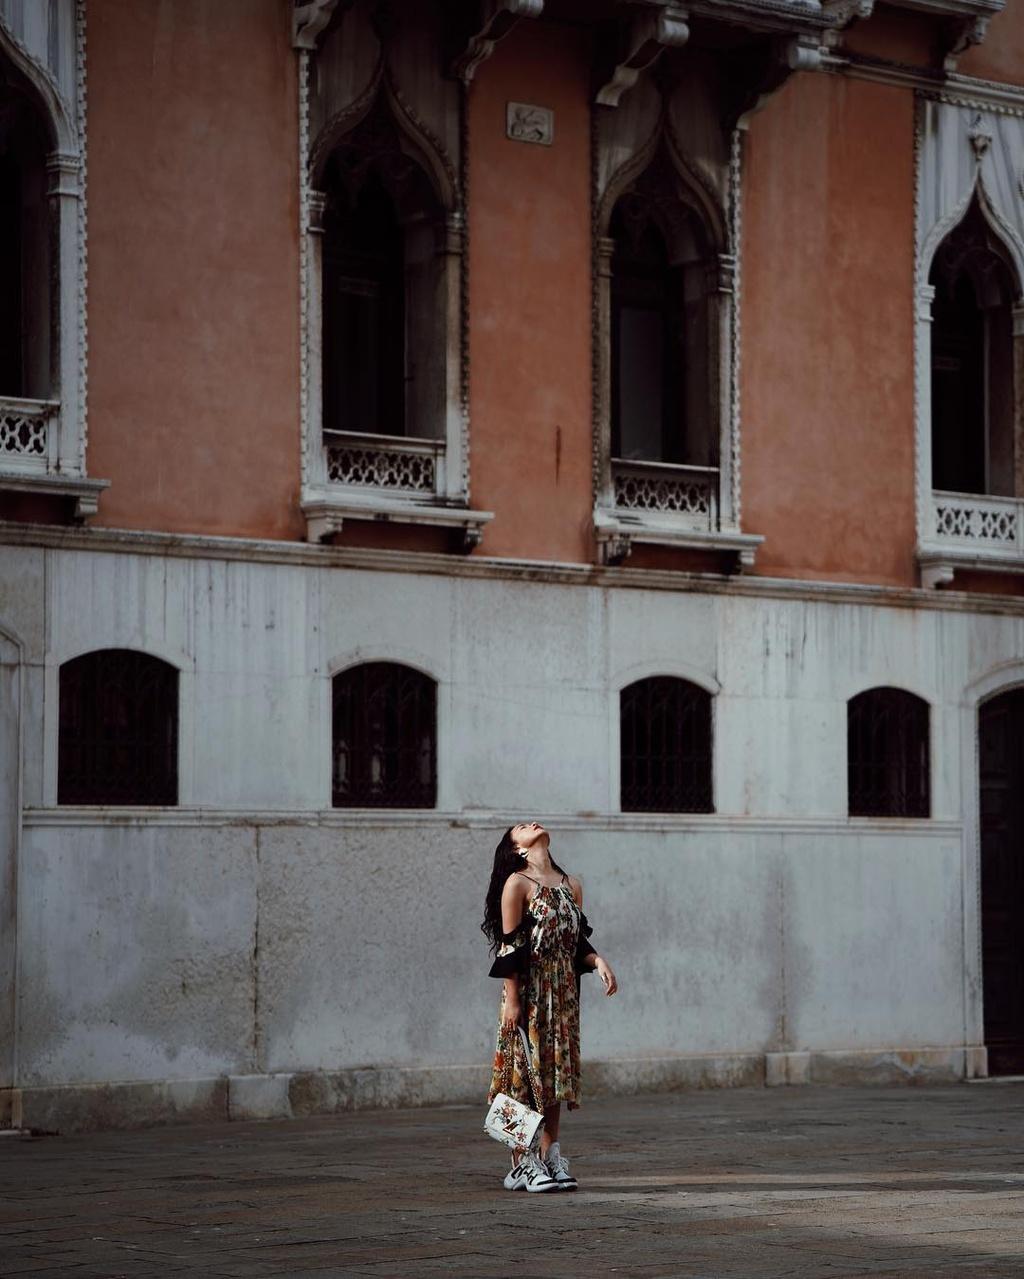 Theo chan Chau Bui den Venice: Lac vao giac mong dep quen loi ve hinh anh 7